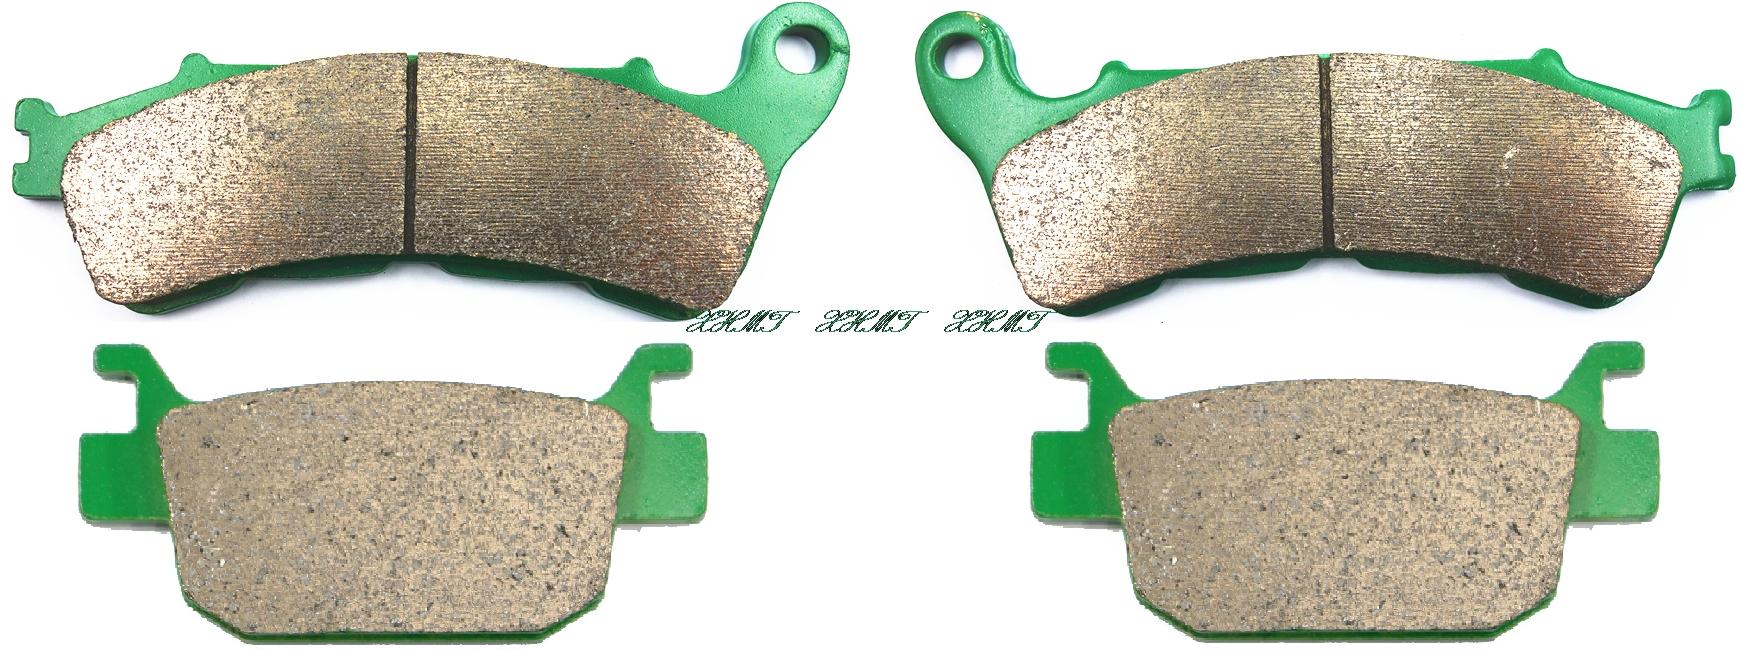 Disc Brake Pads Set HONDA NSS250 NSS 250 FORZA EX X 2005 06-08/ SH300 SH 300 2006 2007 2008 2009 2010 2011 2012 2013 2014